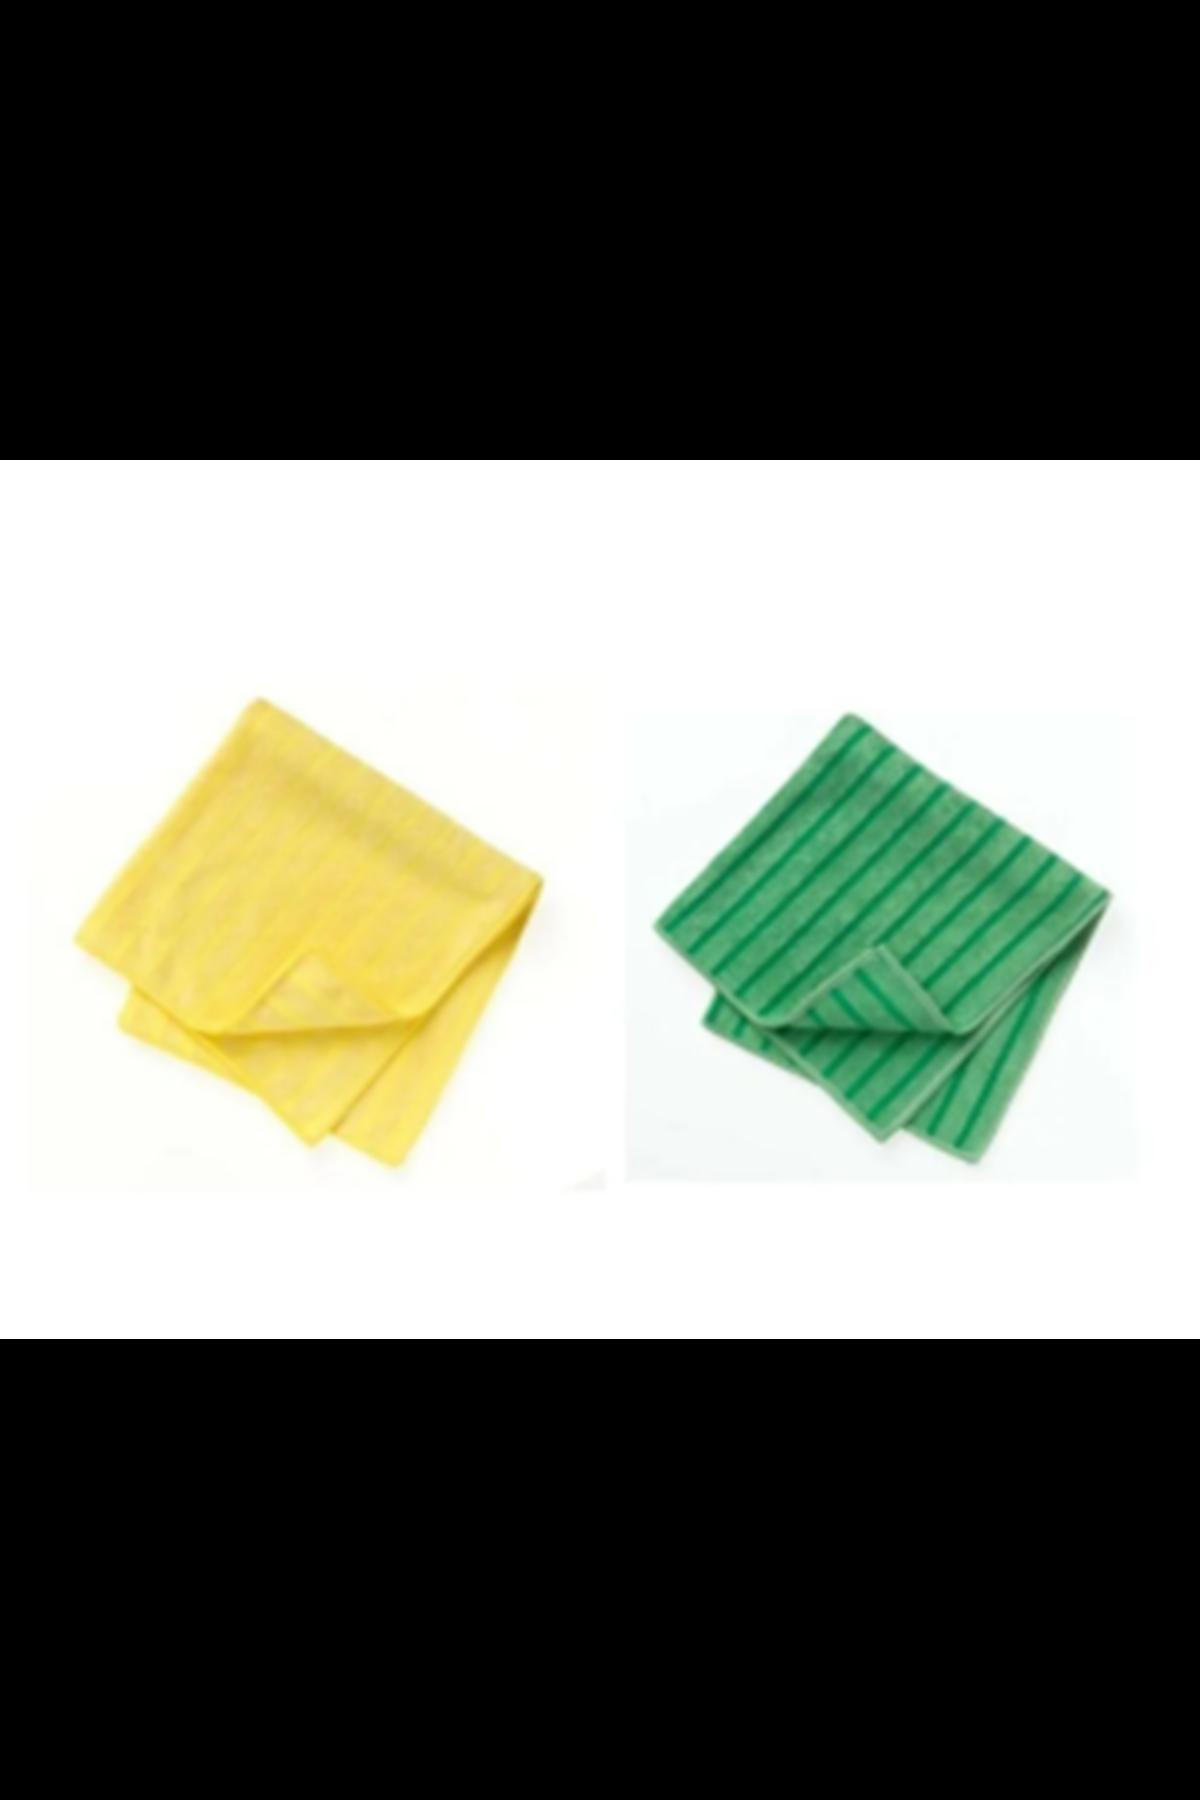 3M Scotch Brite Mikrofiber Sarı/Yeşil Bez 40*40 4 Adet (SB2025)